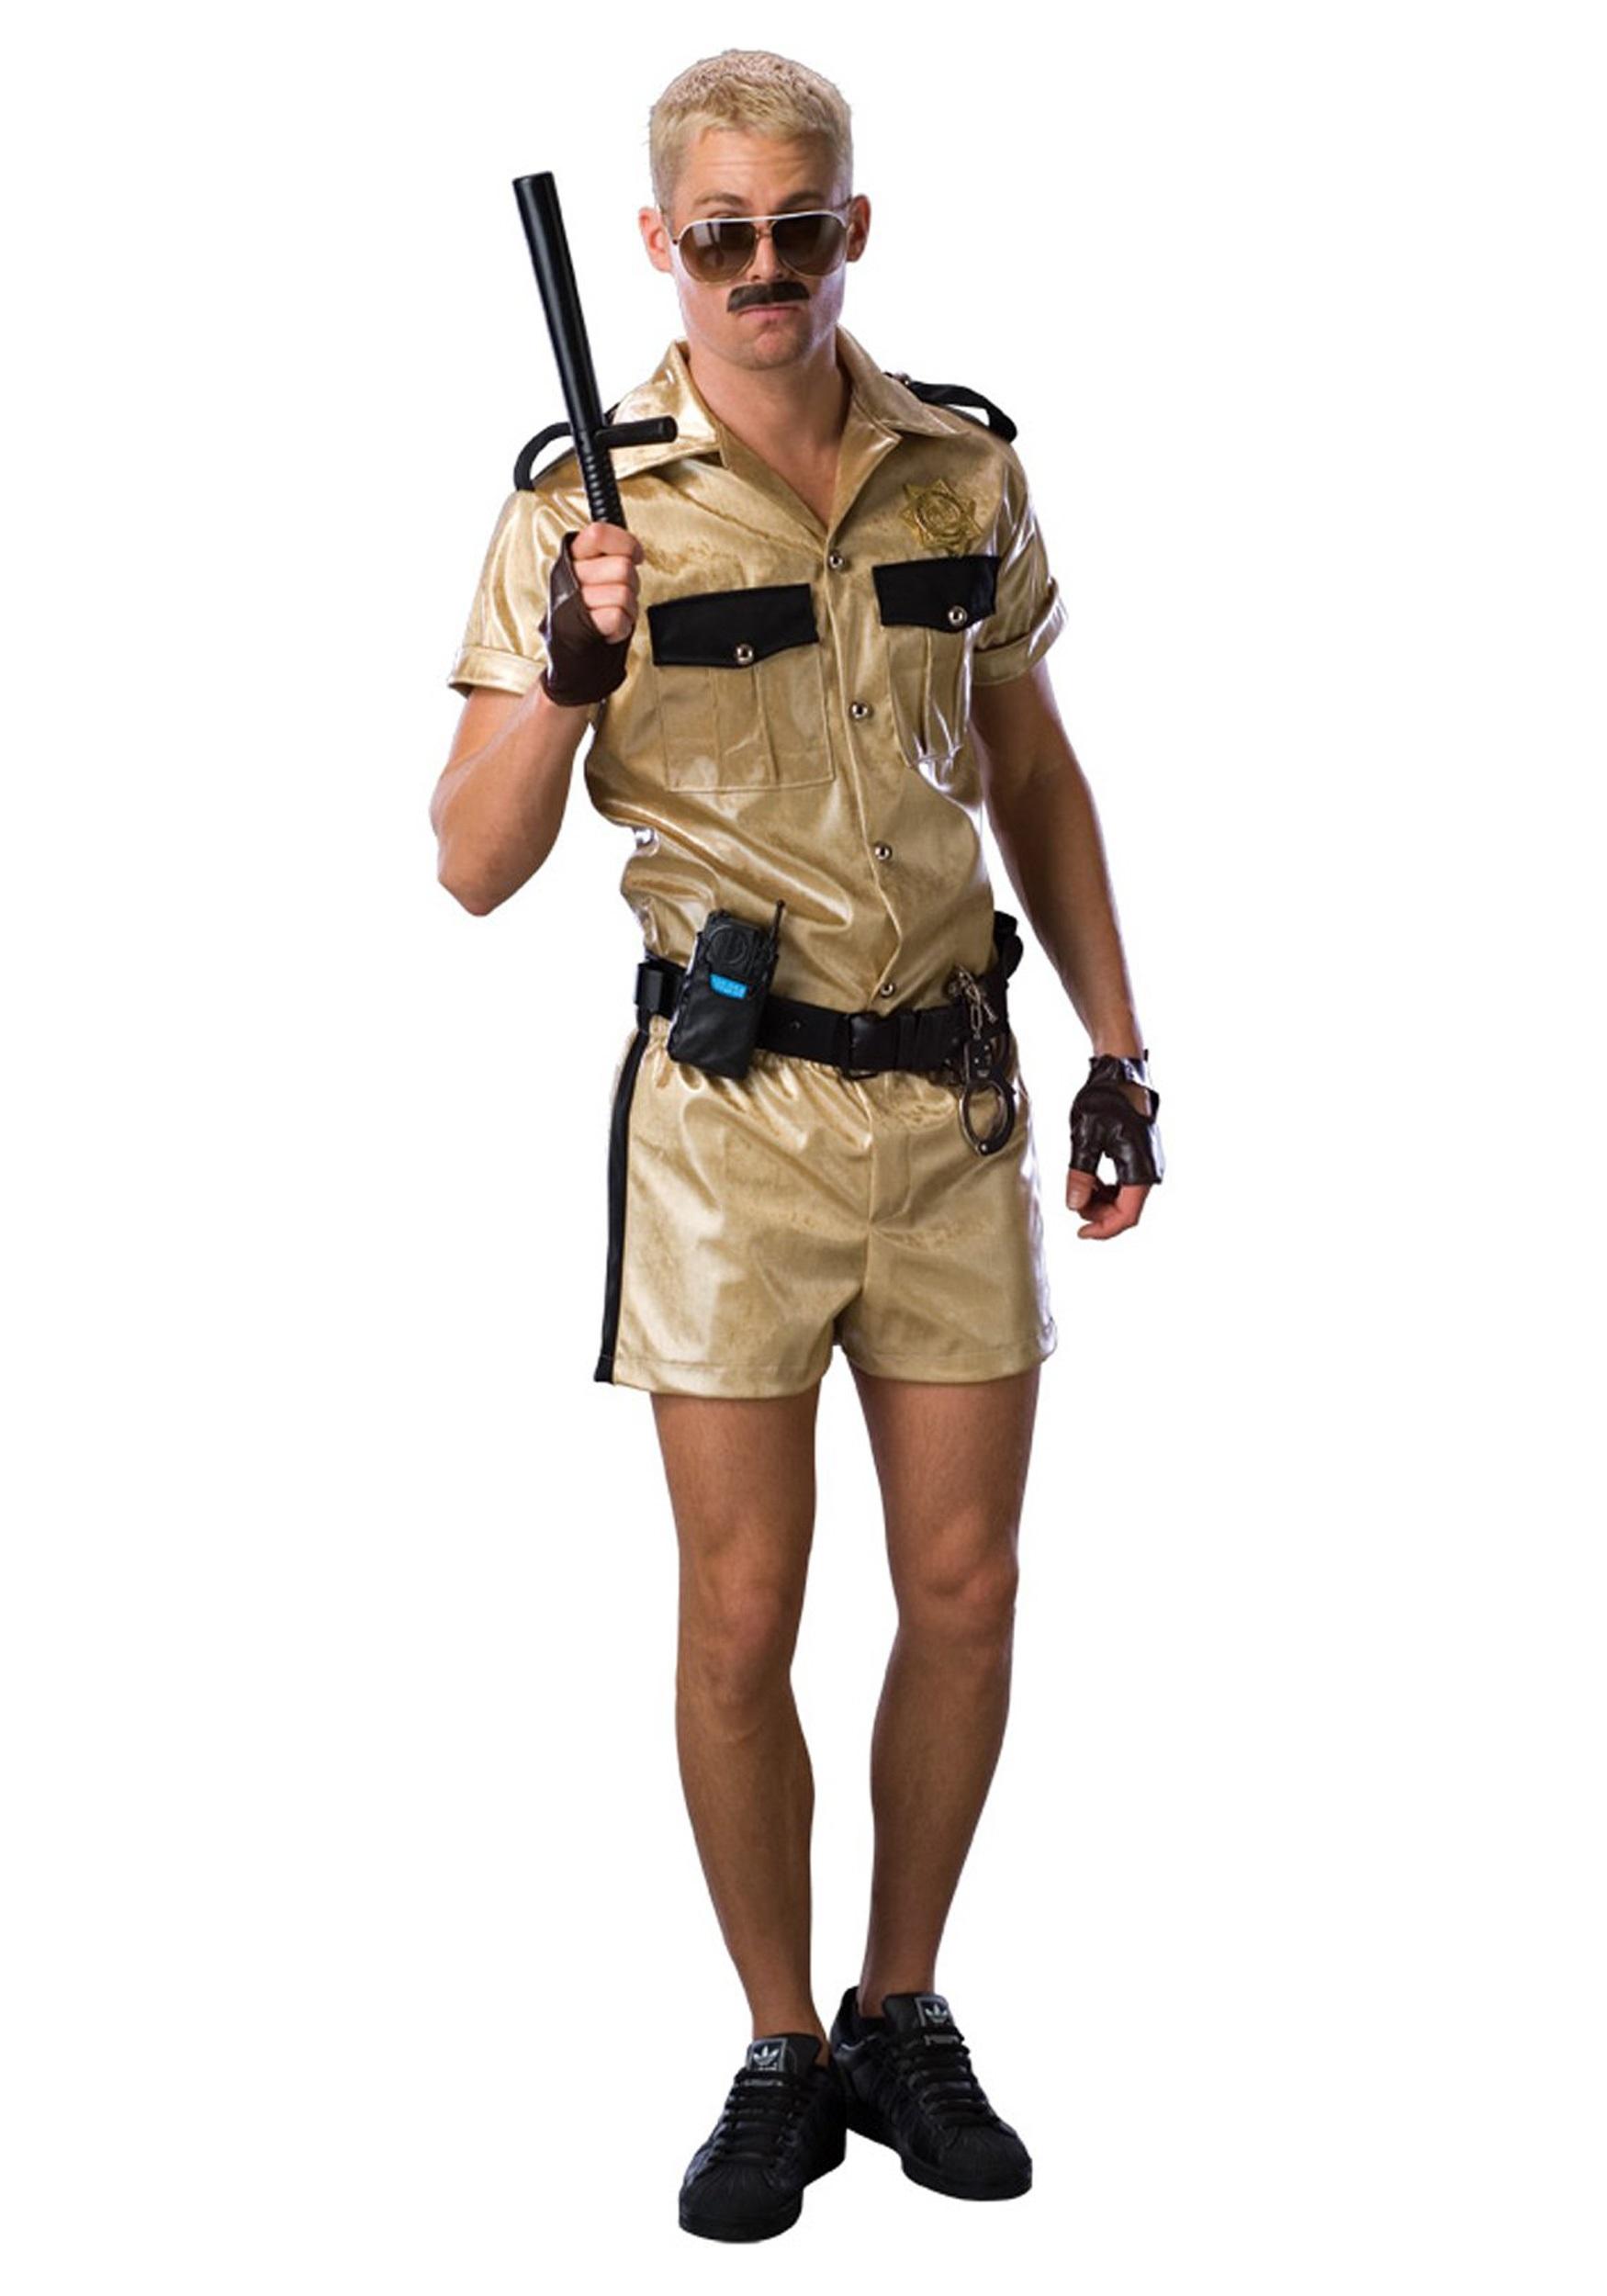 lt dangle deluxe costume - funny halloween reno 911 costumes